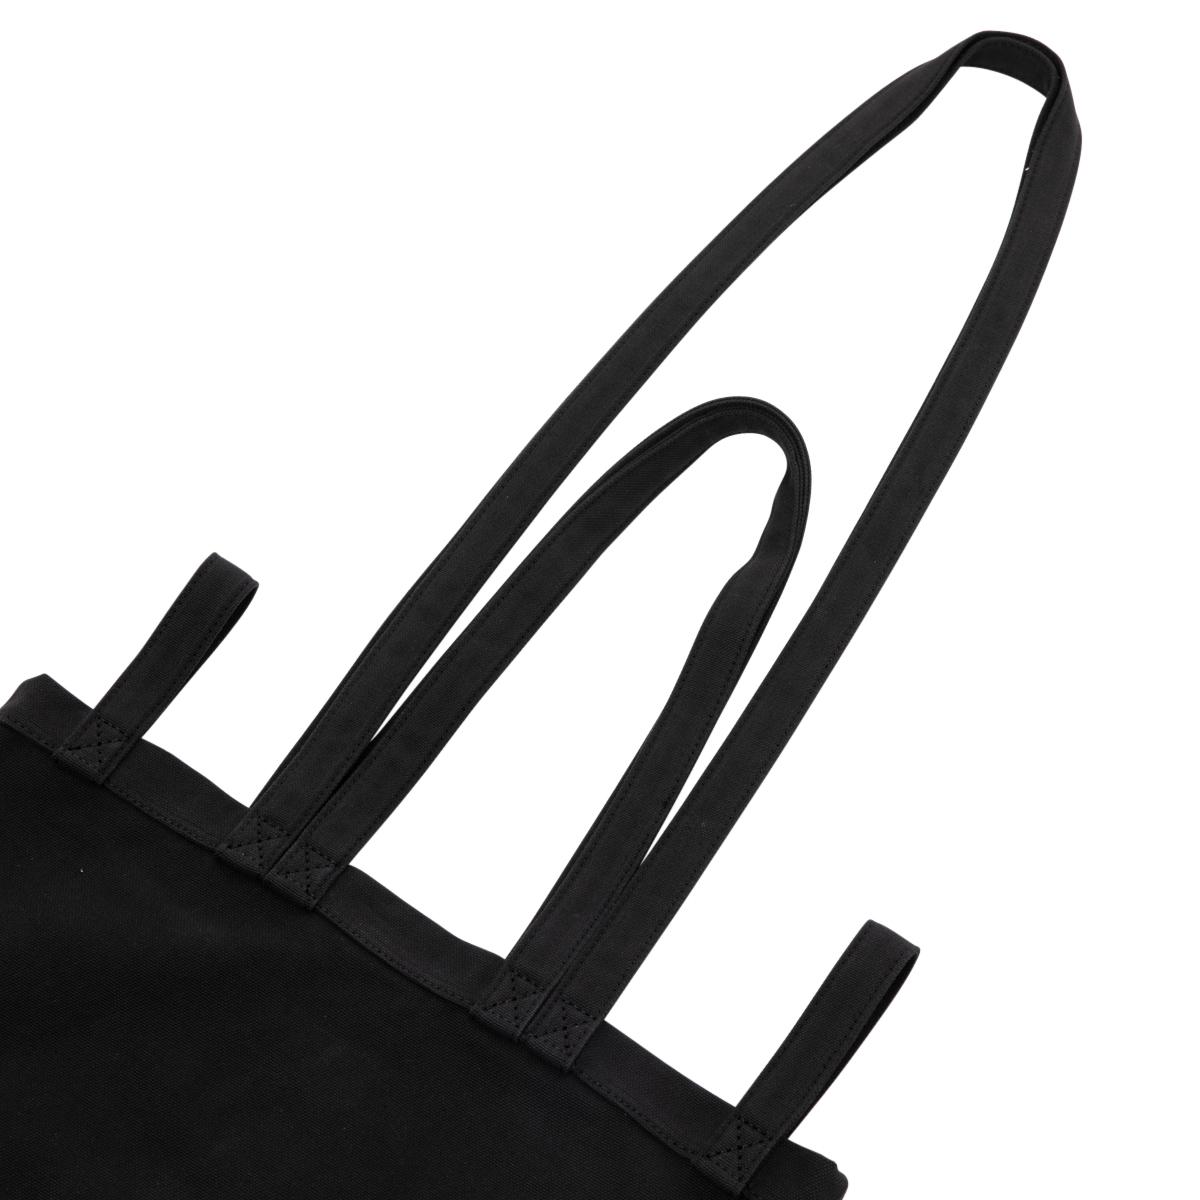 MM6 Maison Margiela 6 Handle Bag - Classic